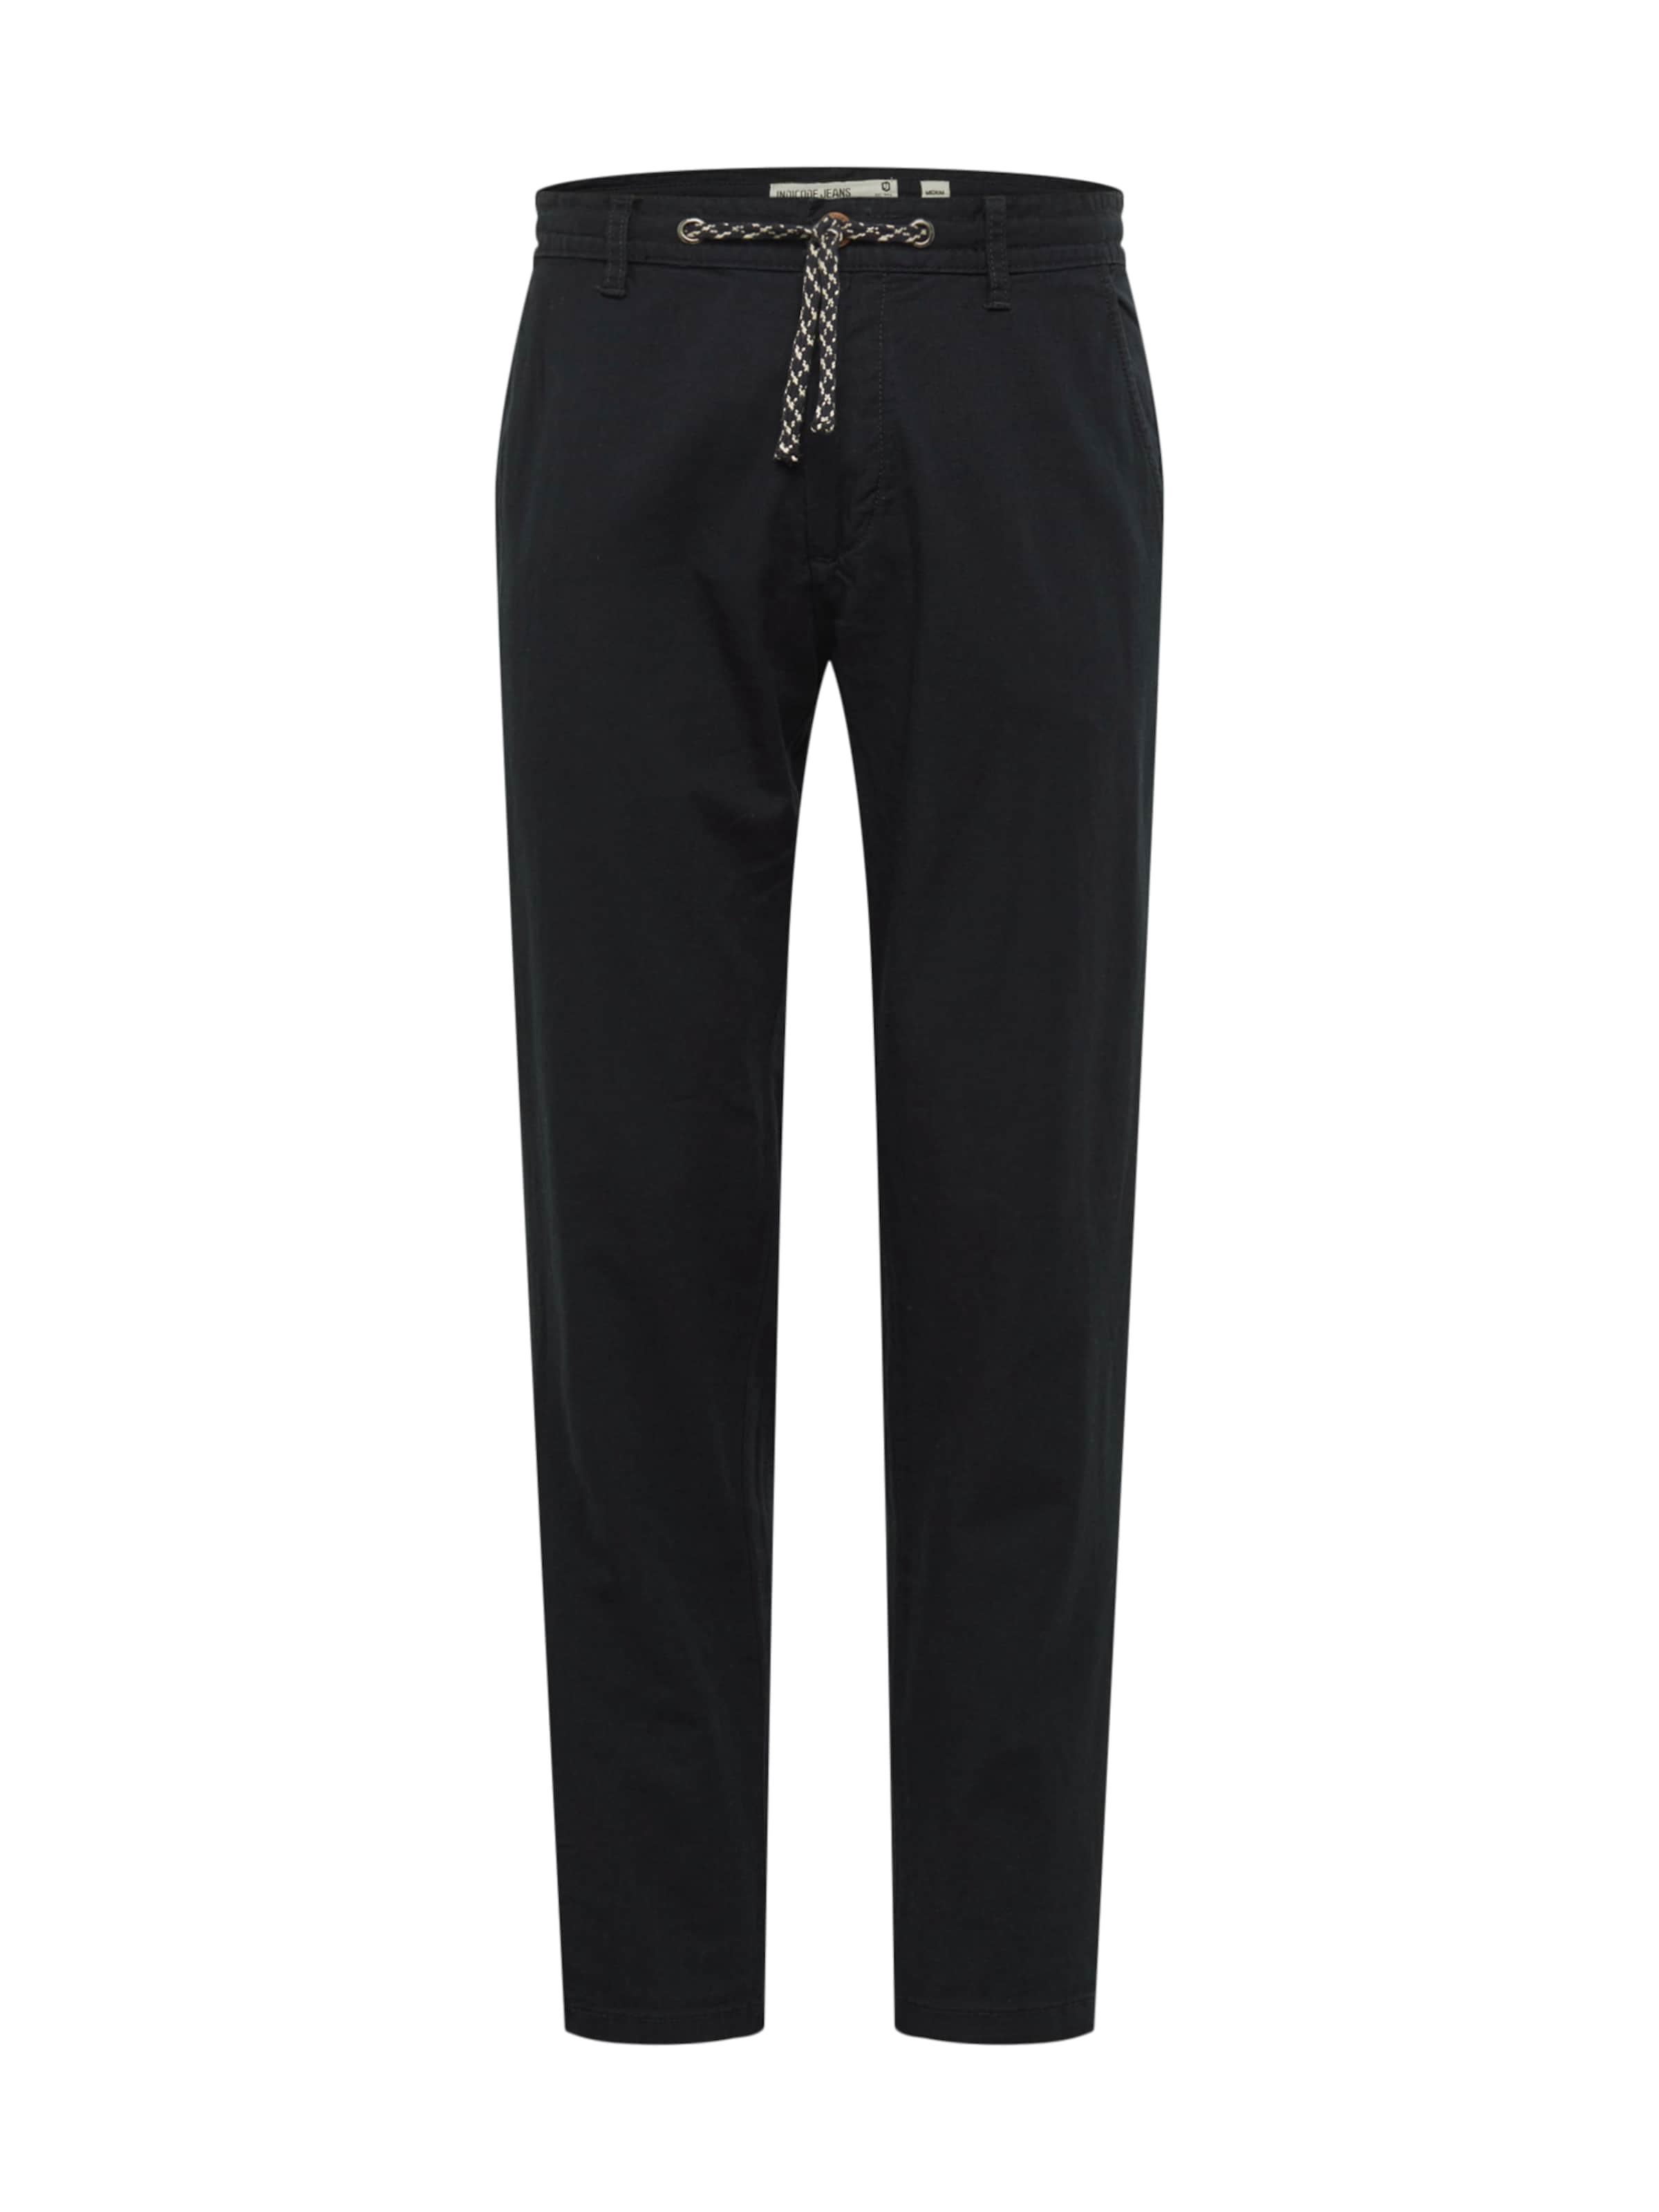 Pantalon Marine Indicode 'venedig' Bleu En Jeans w7PZq7Y1